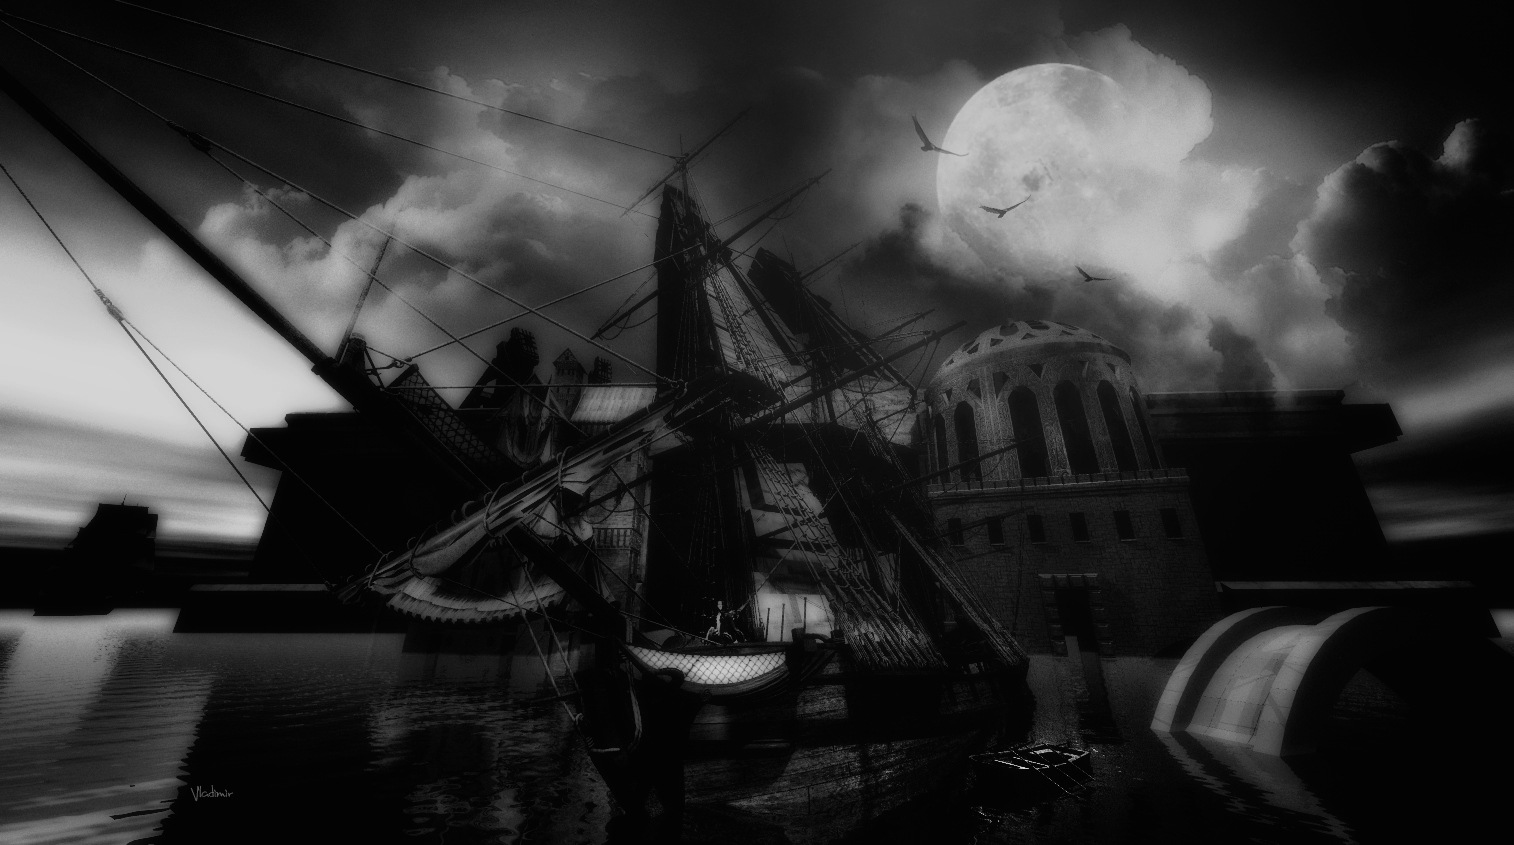 Boat by Vladimir Desancic